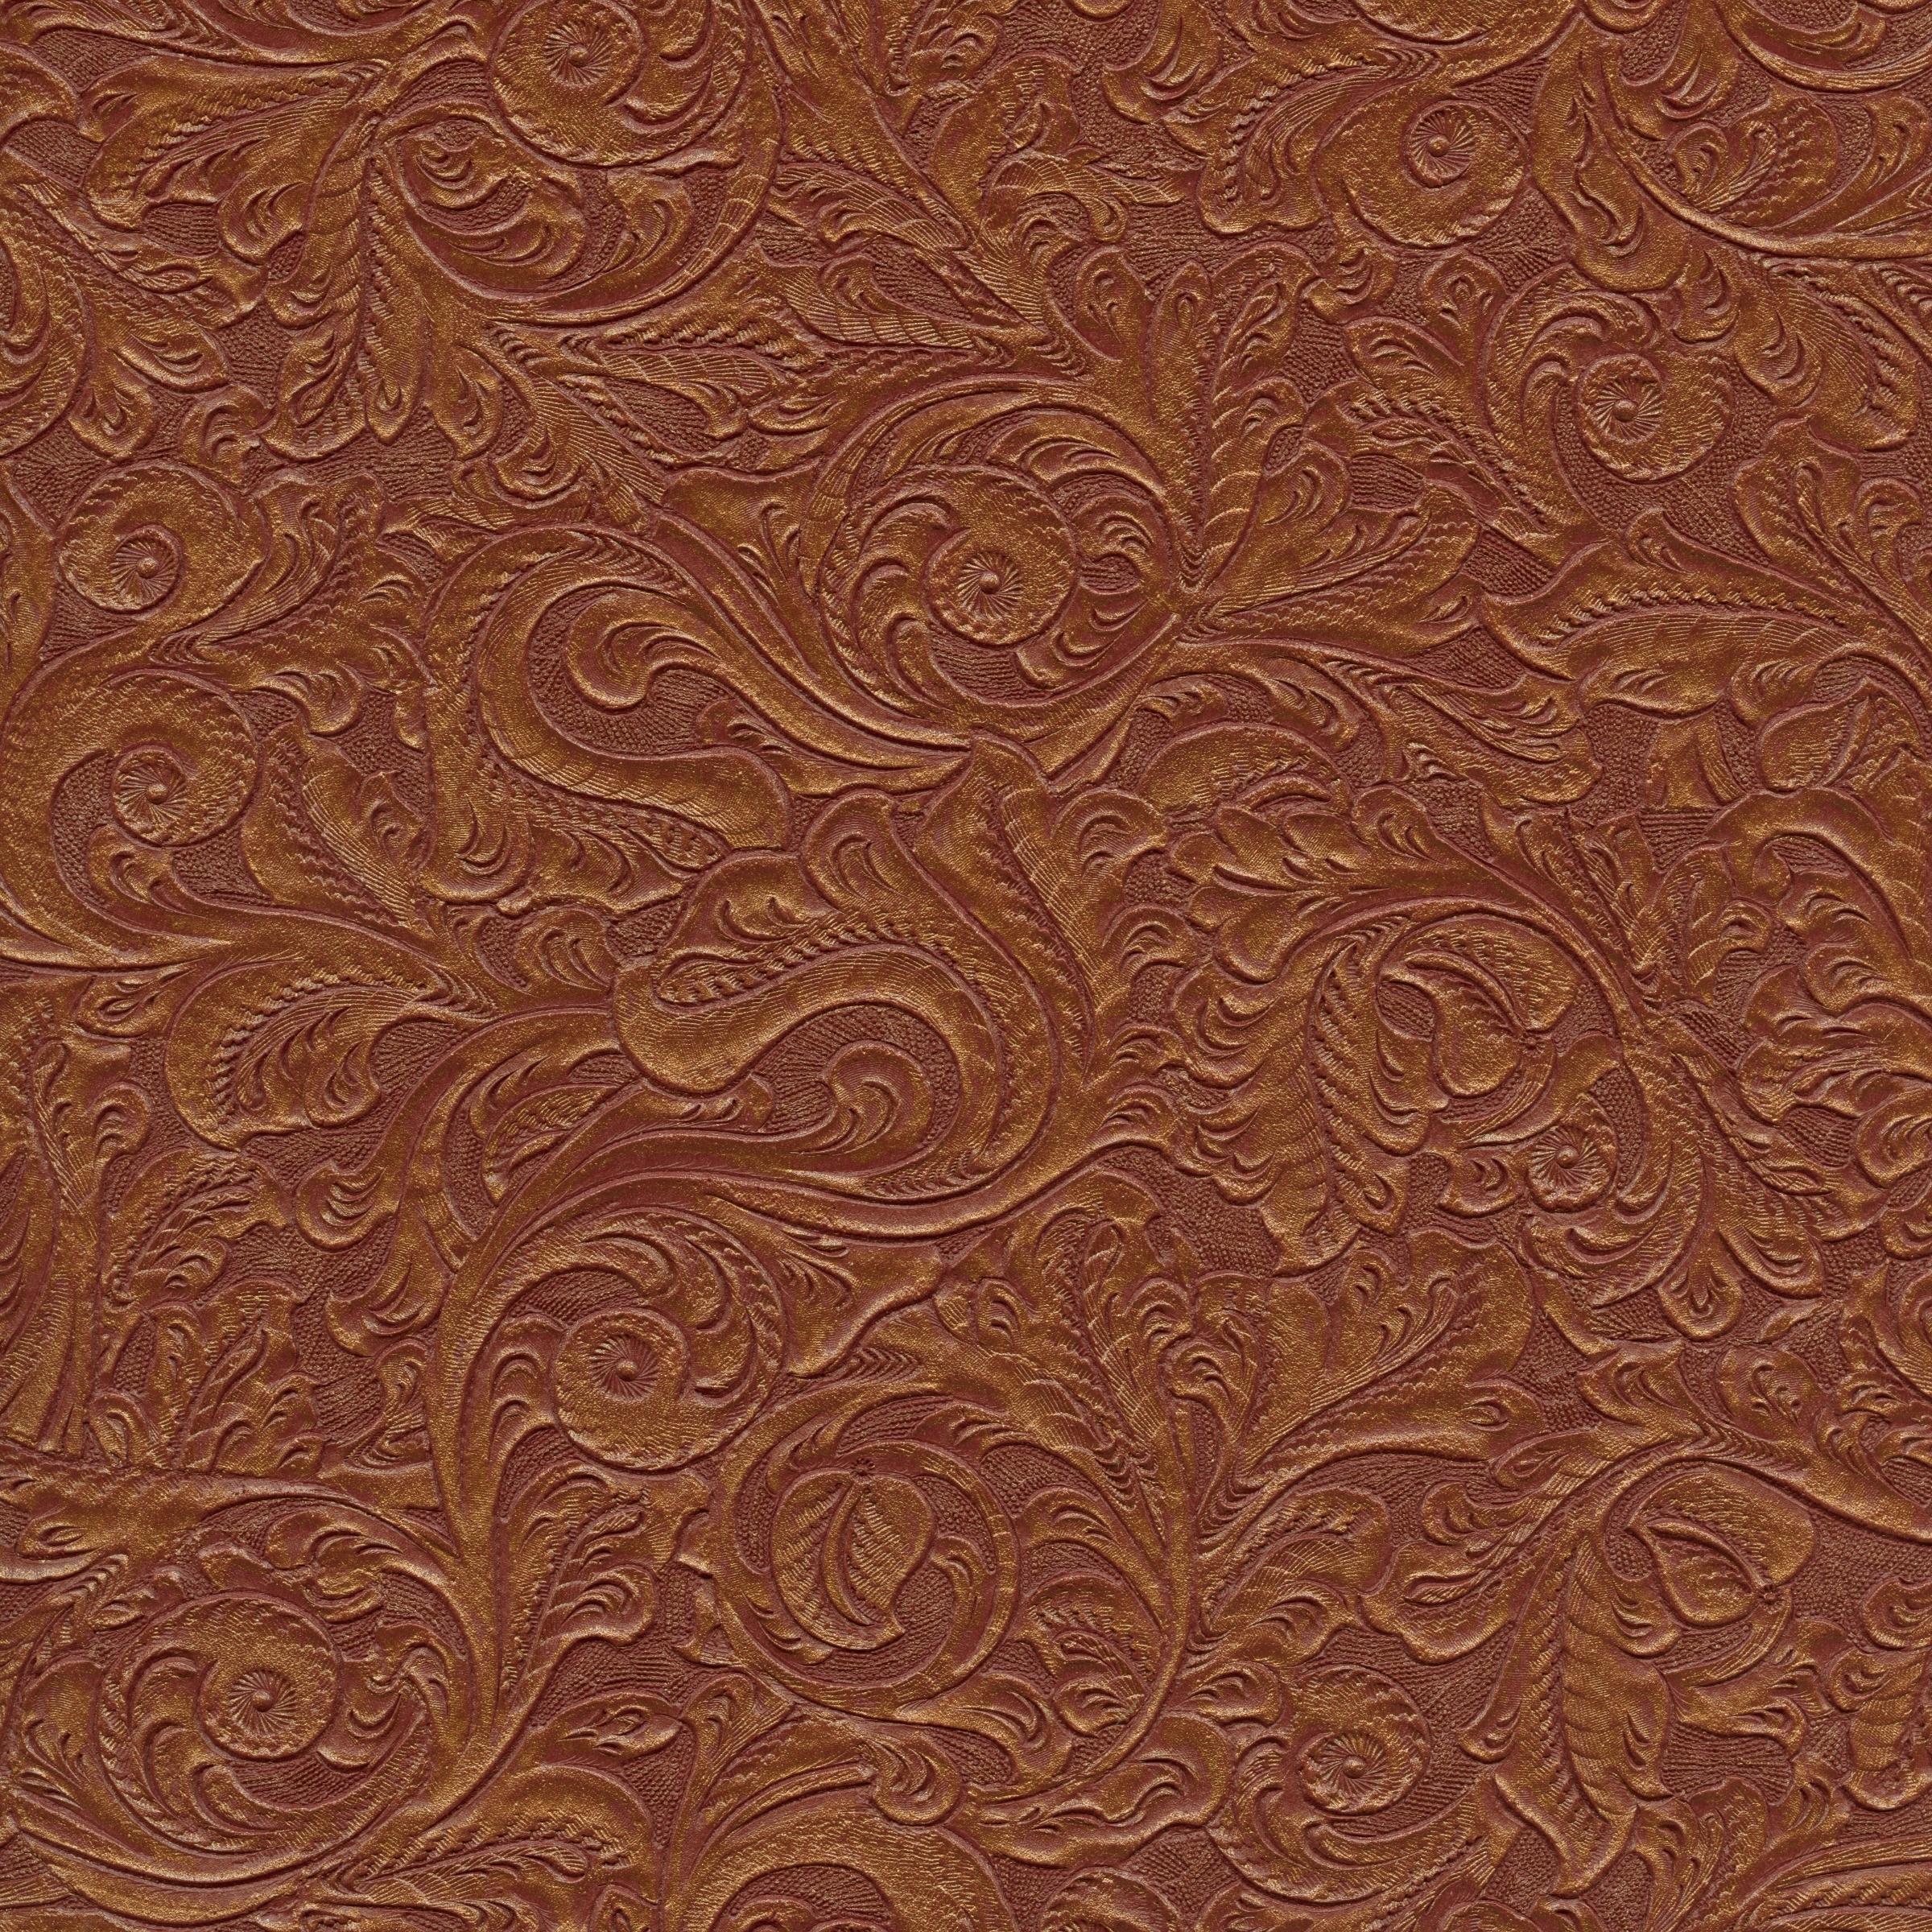 Wa6101 Eades Discount Wallpaper Discount Fabric